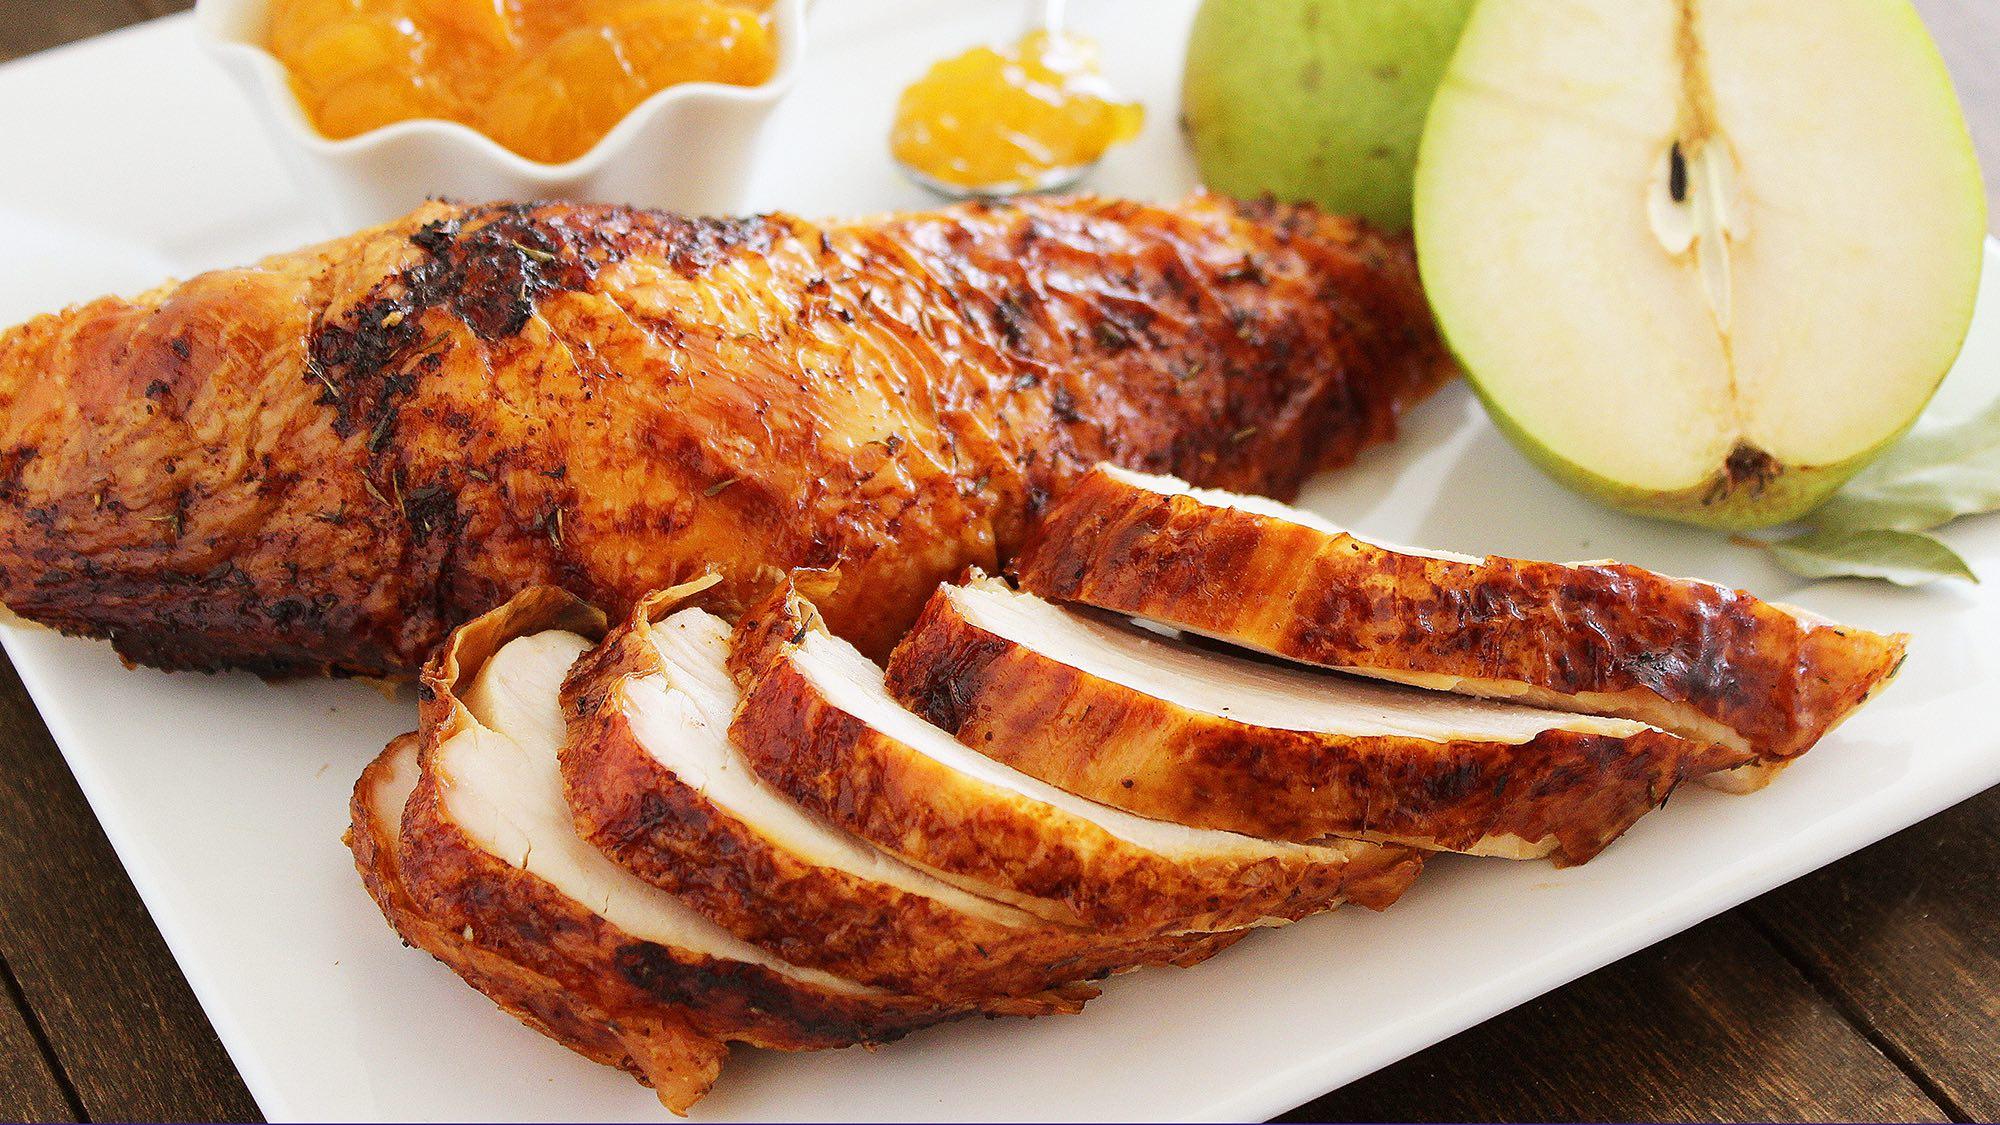 bay-leaf-and-honey-glazed-turkey-with-pear-chutney.jpg